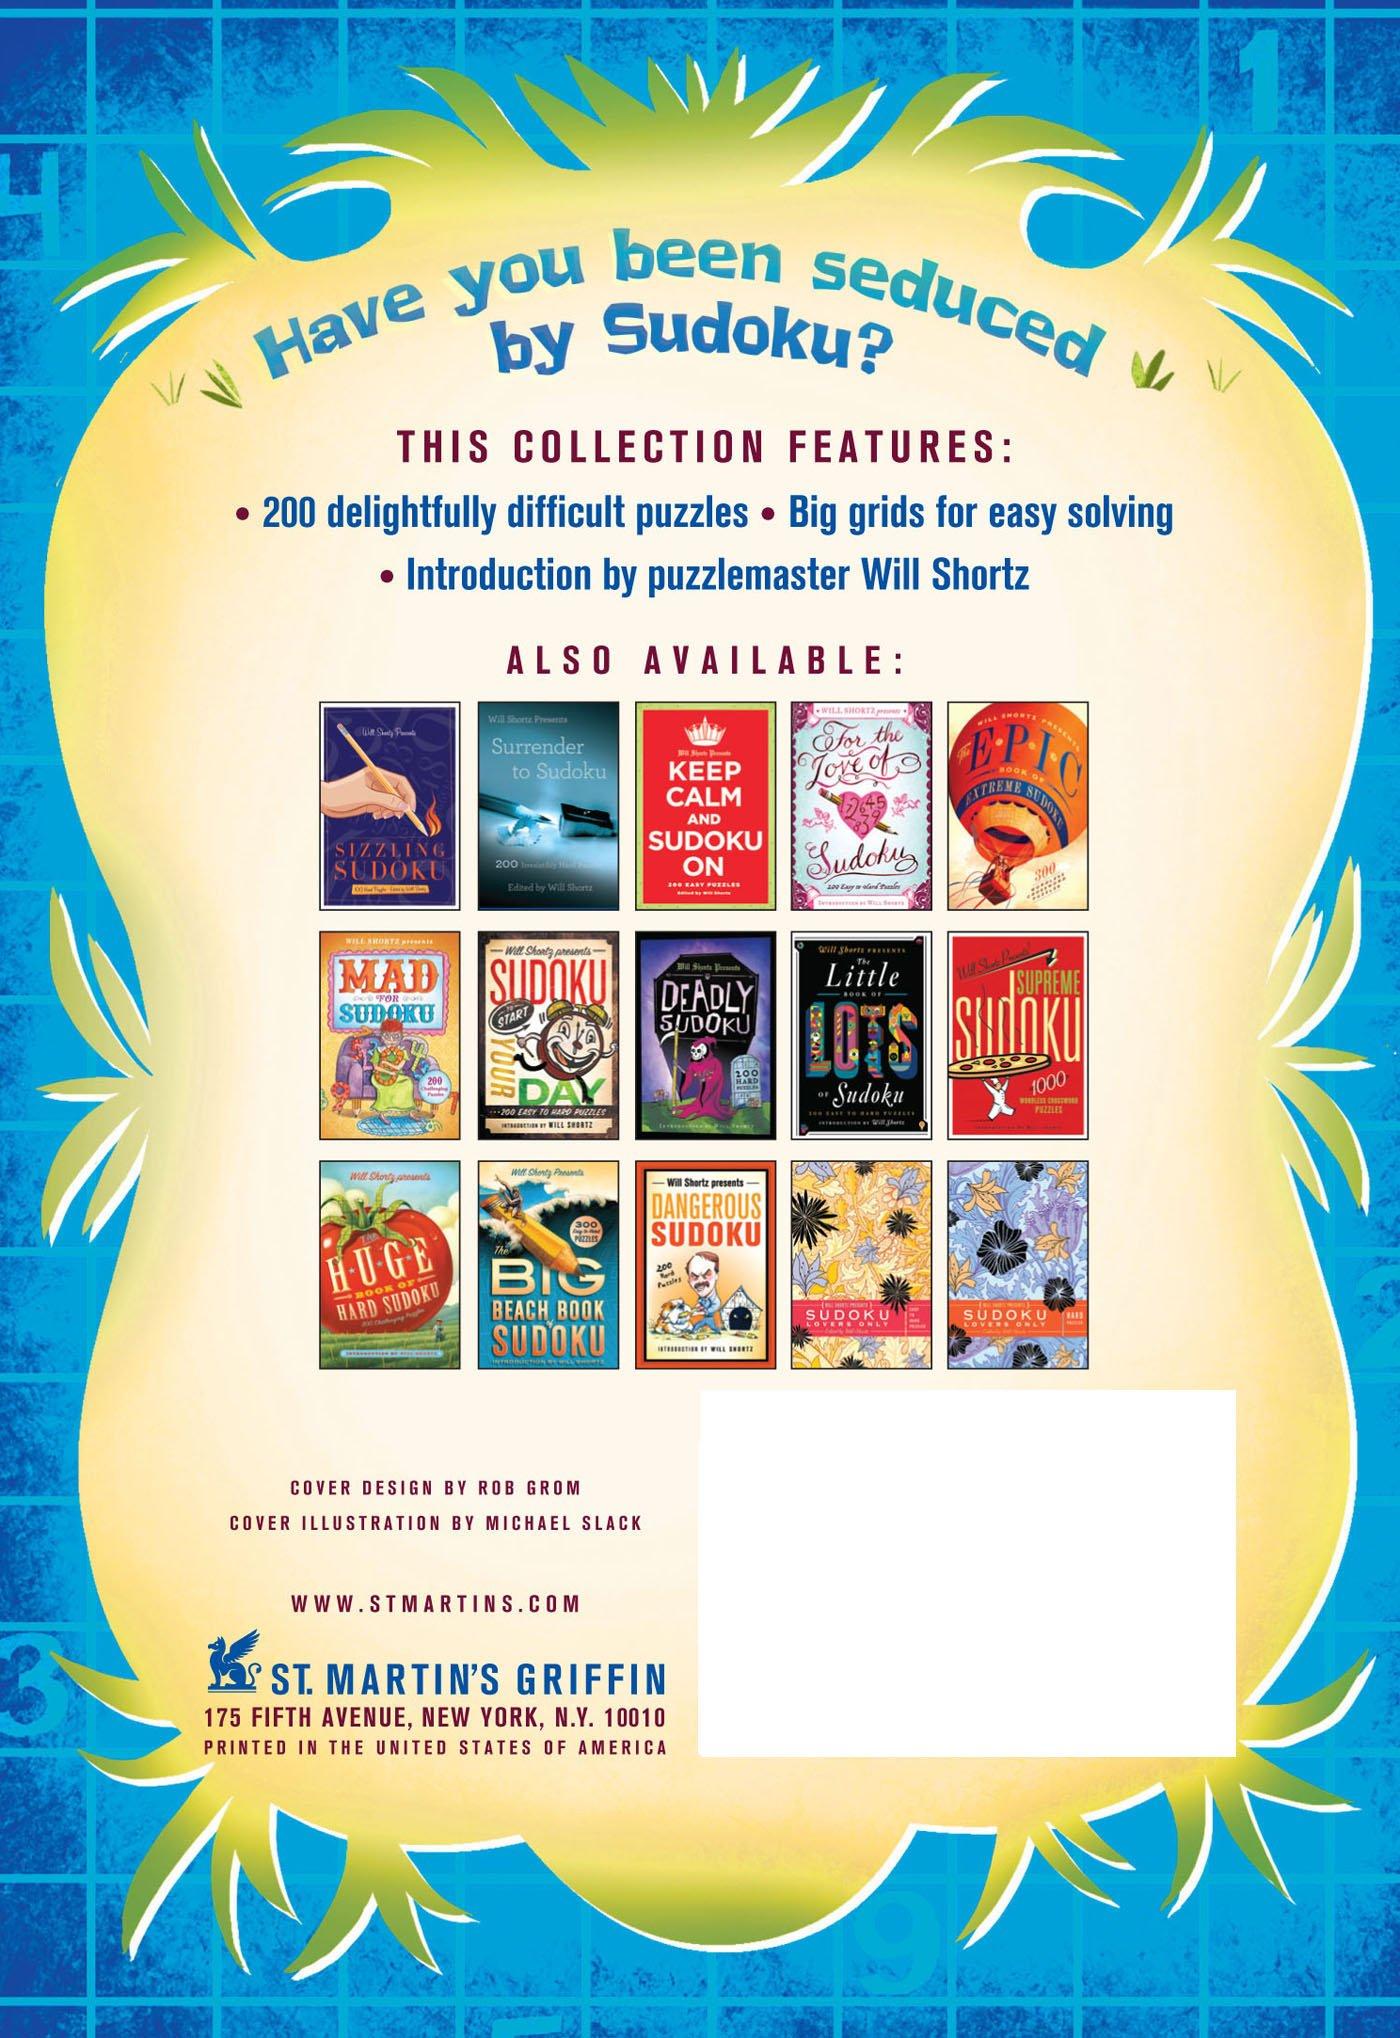 Will Shortz Presents Wild for Sudoku: 200 Challenging Puzzles: Will Shortz:  9781250032607: Amazon.com: Books